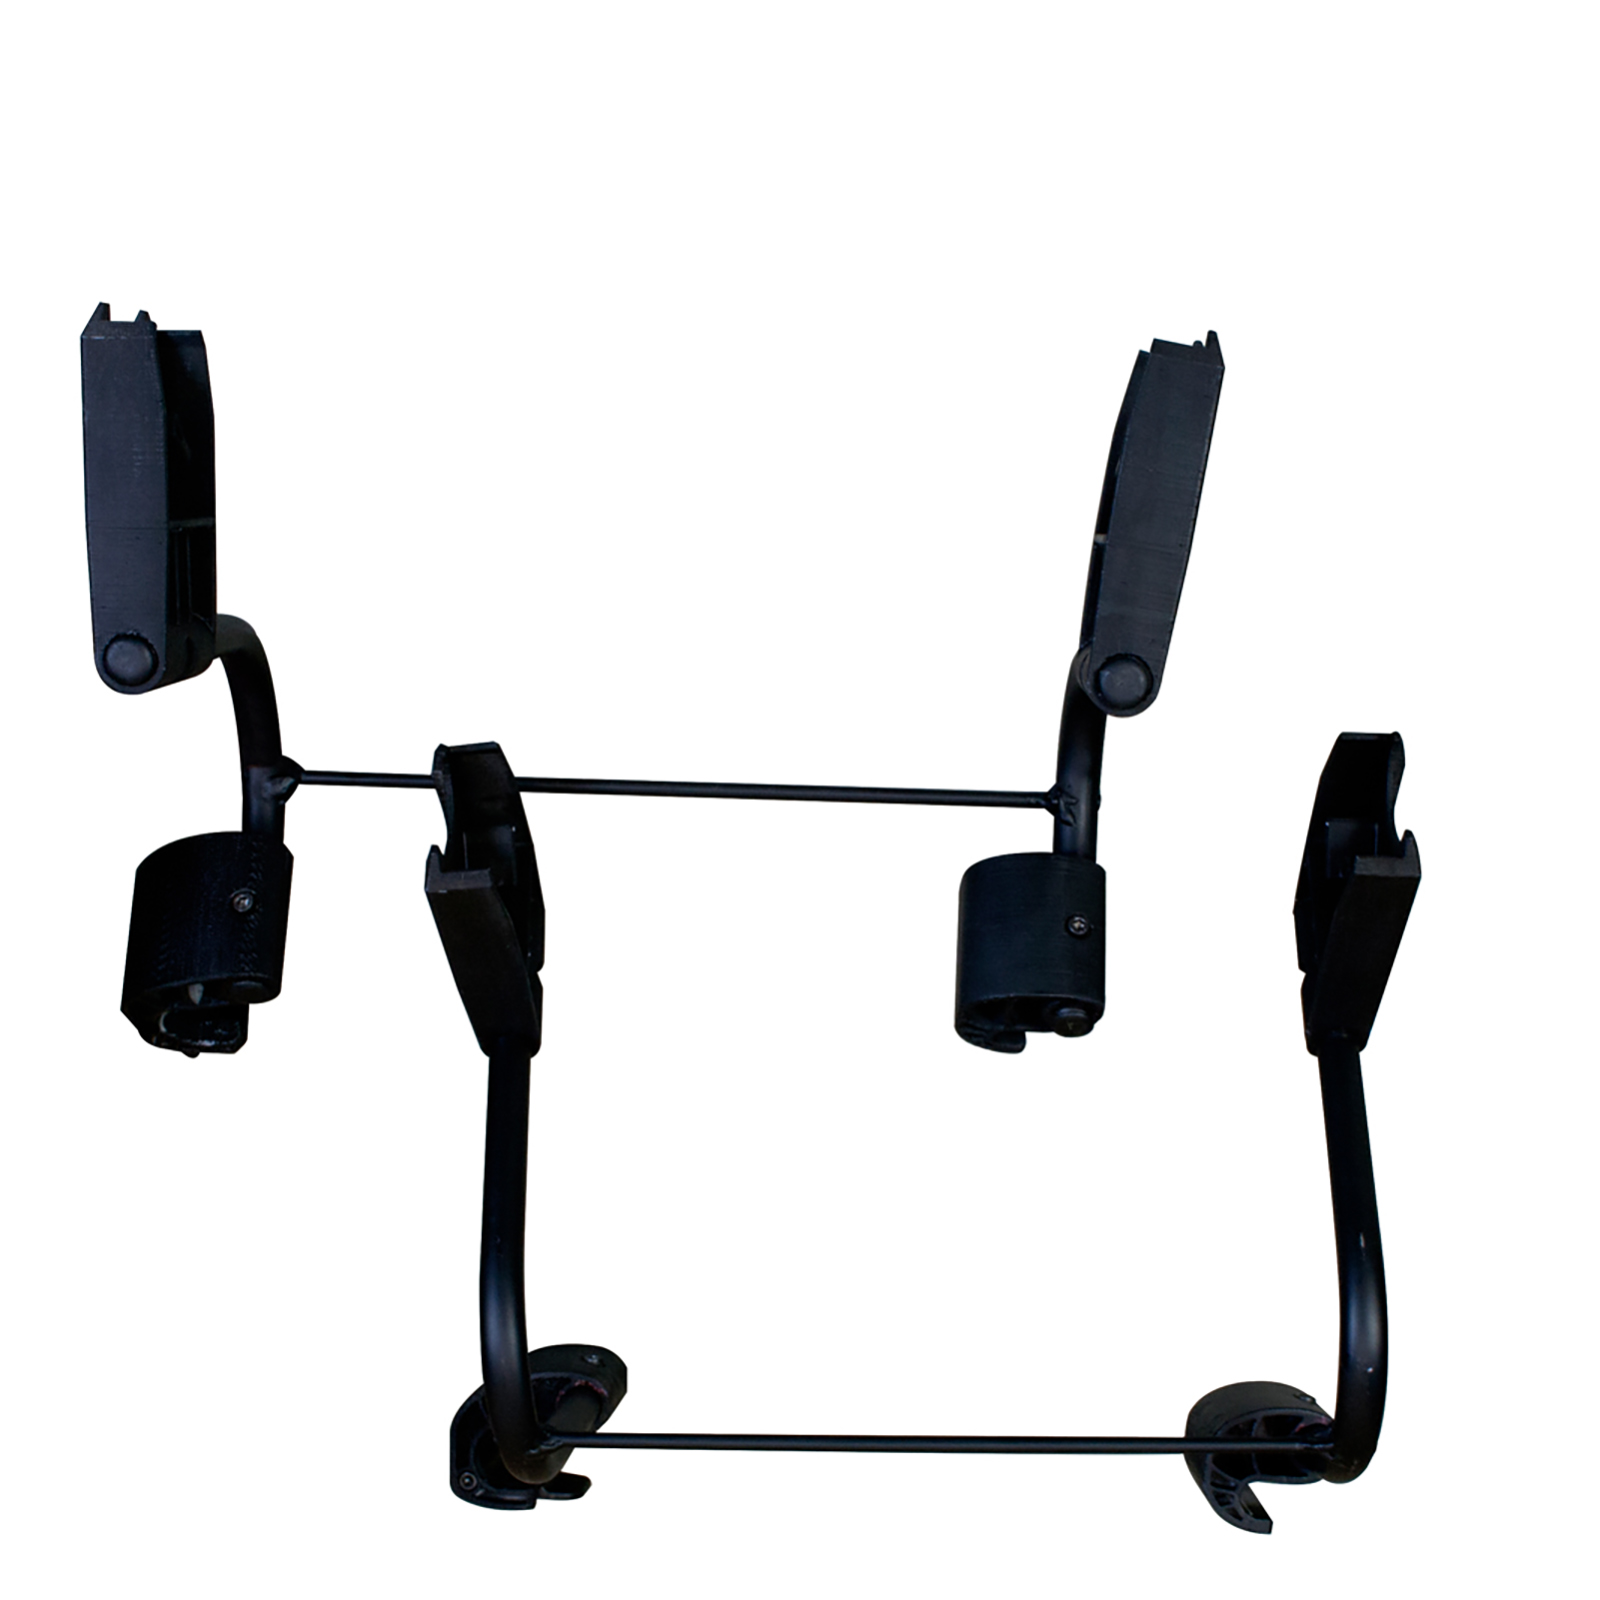 Mountain Buggy Duet Car Seat Adaptors (Clip 31 - For 2 Car Seats)